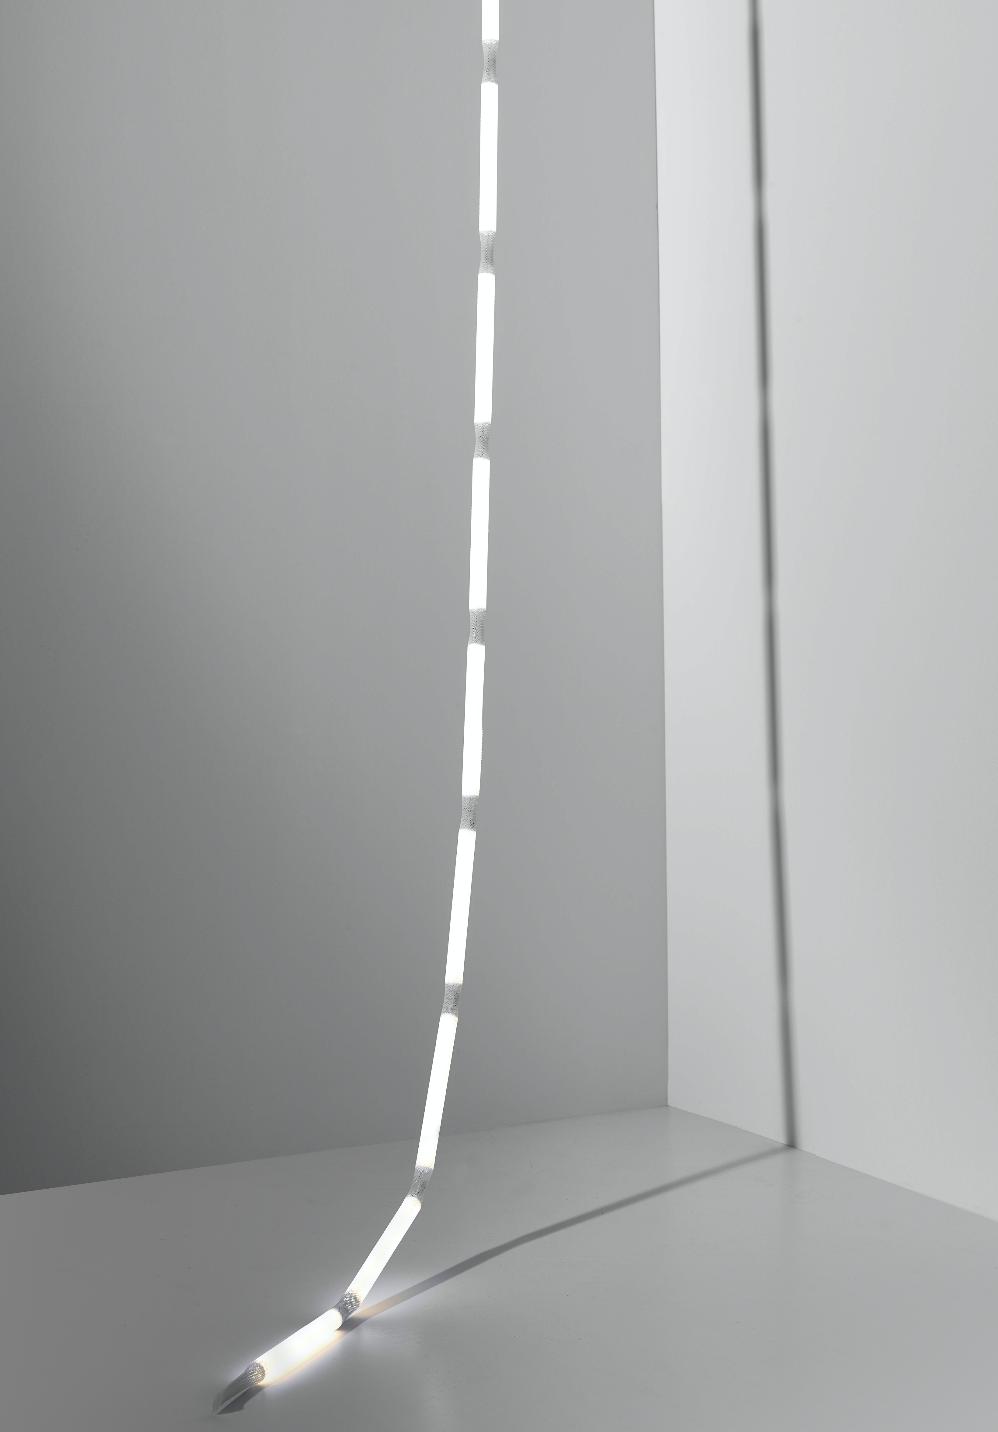 Verena_Hennig_Rope_Light2_small.jpg